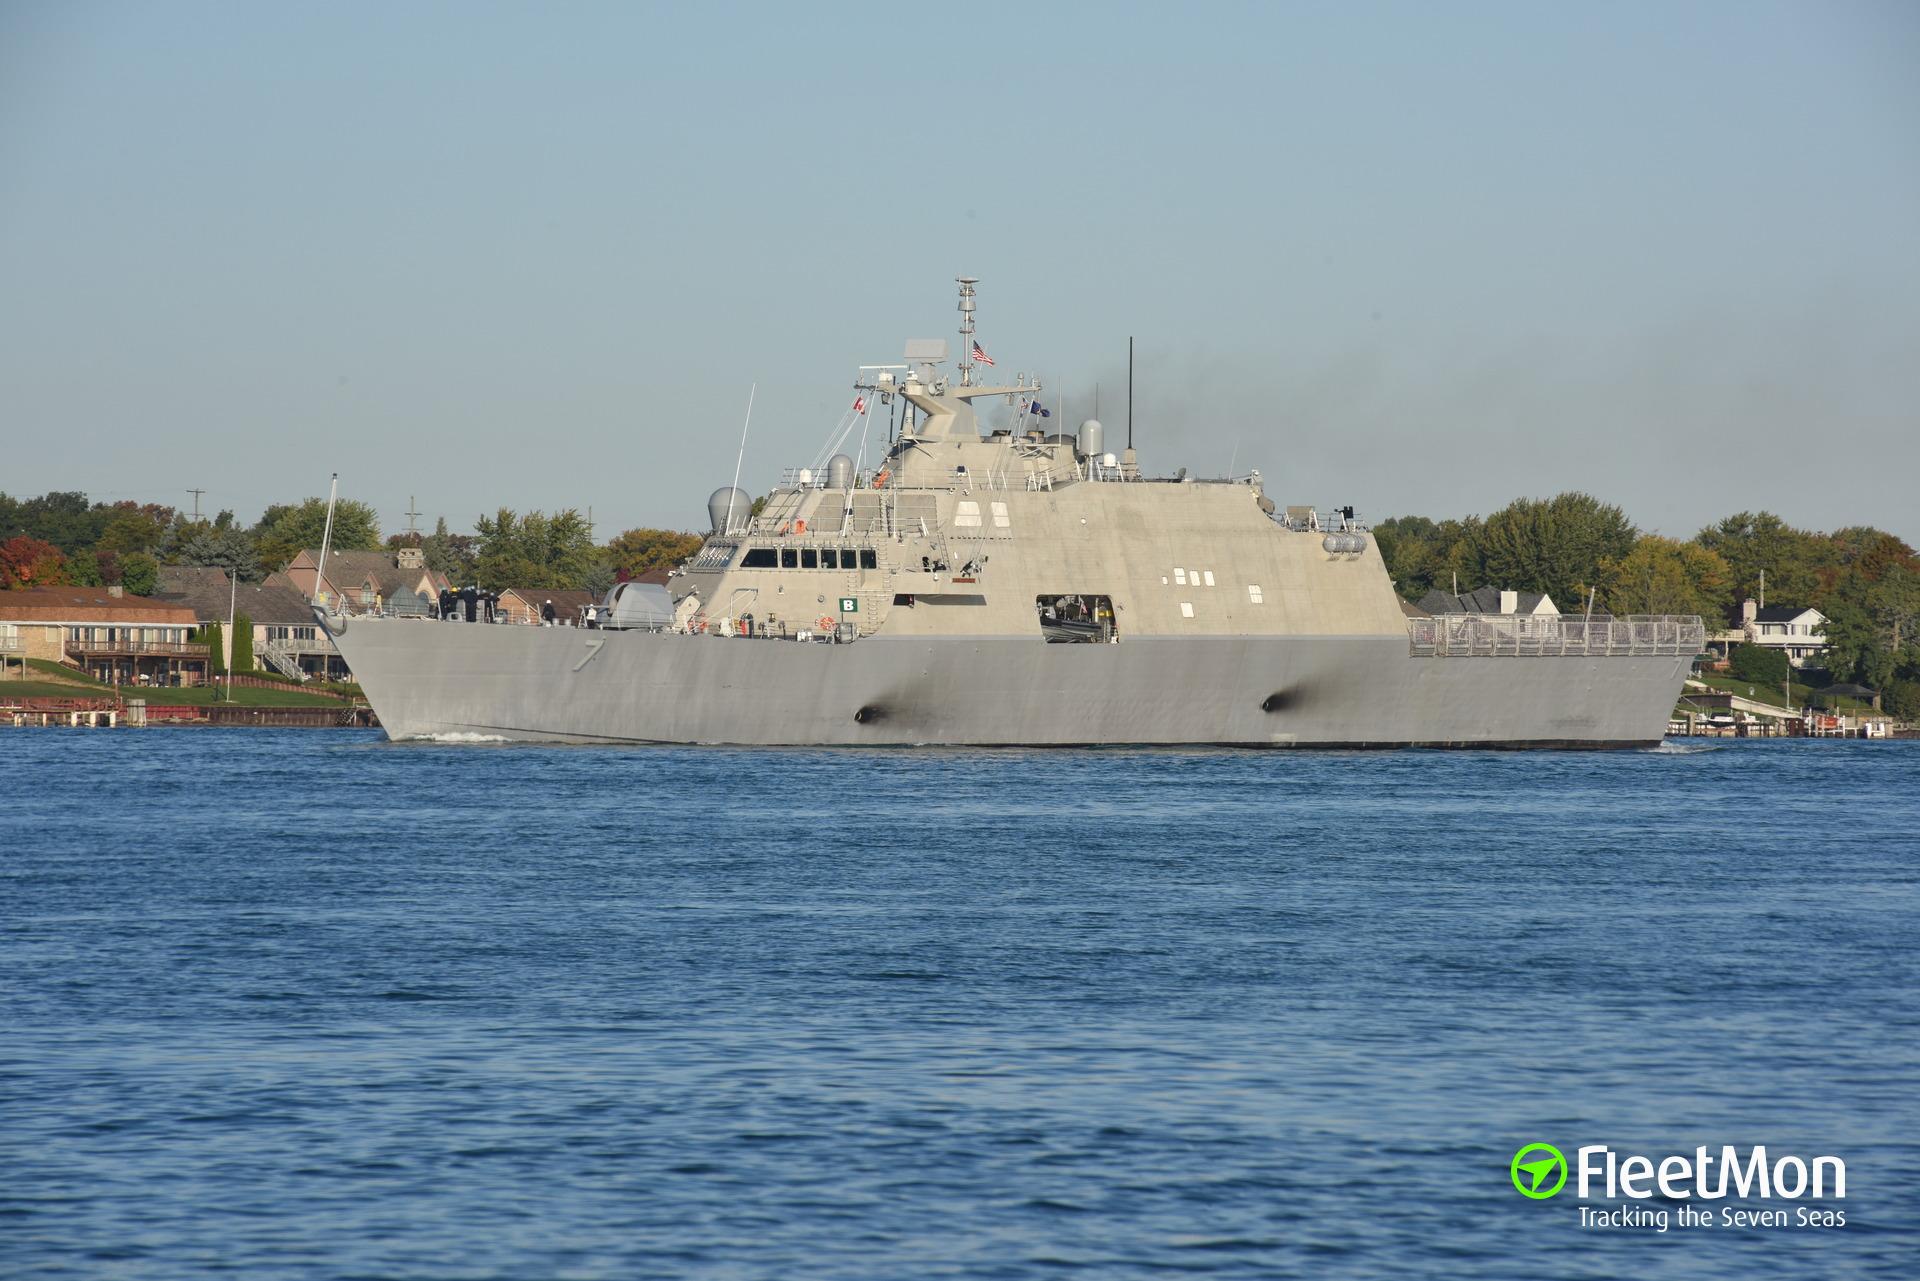 Photo of USS DETROIT LCS7 (MMSI: 369970708, Callsign: None